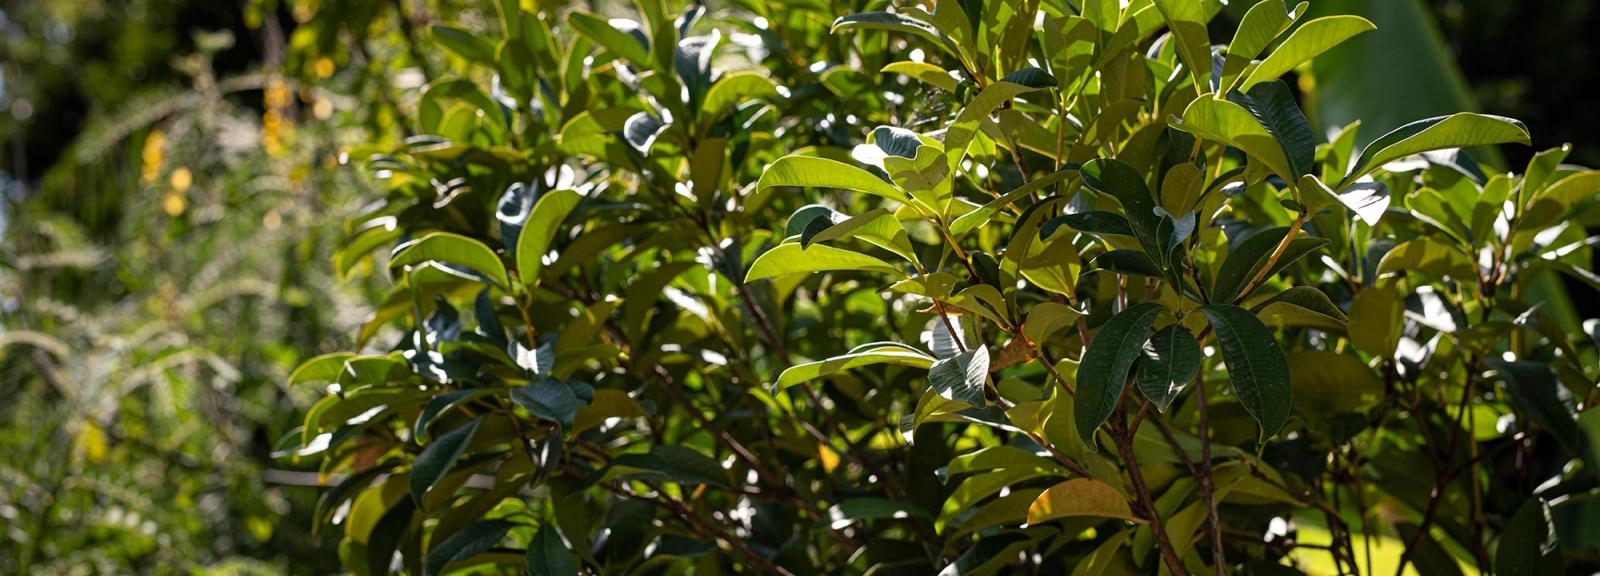 Cerisier du Brésil (Eugenia brasiliensis) - Jardin botanique Val Rahmeh-Menton © MNHN - Agnès Iatzoura